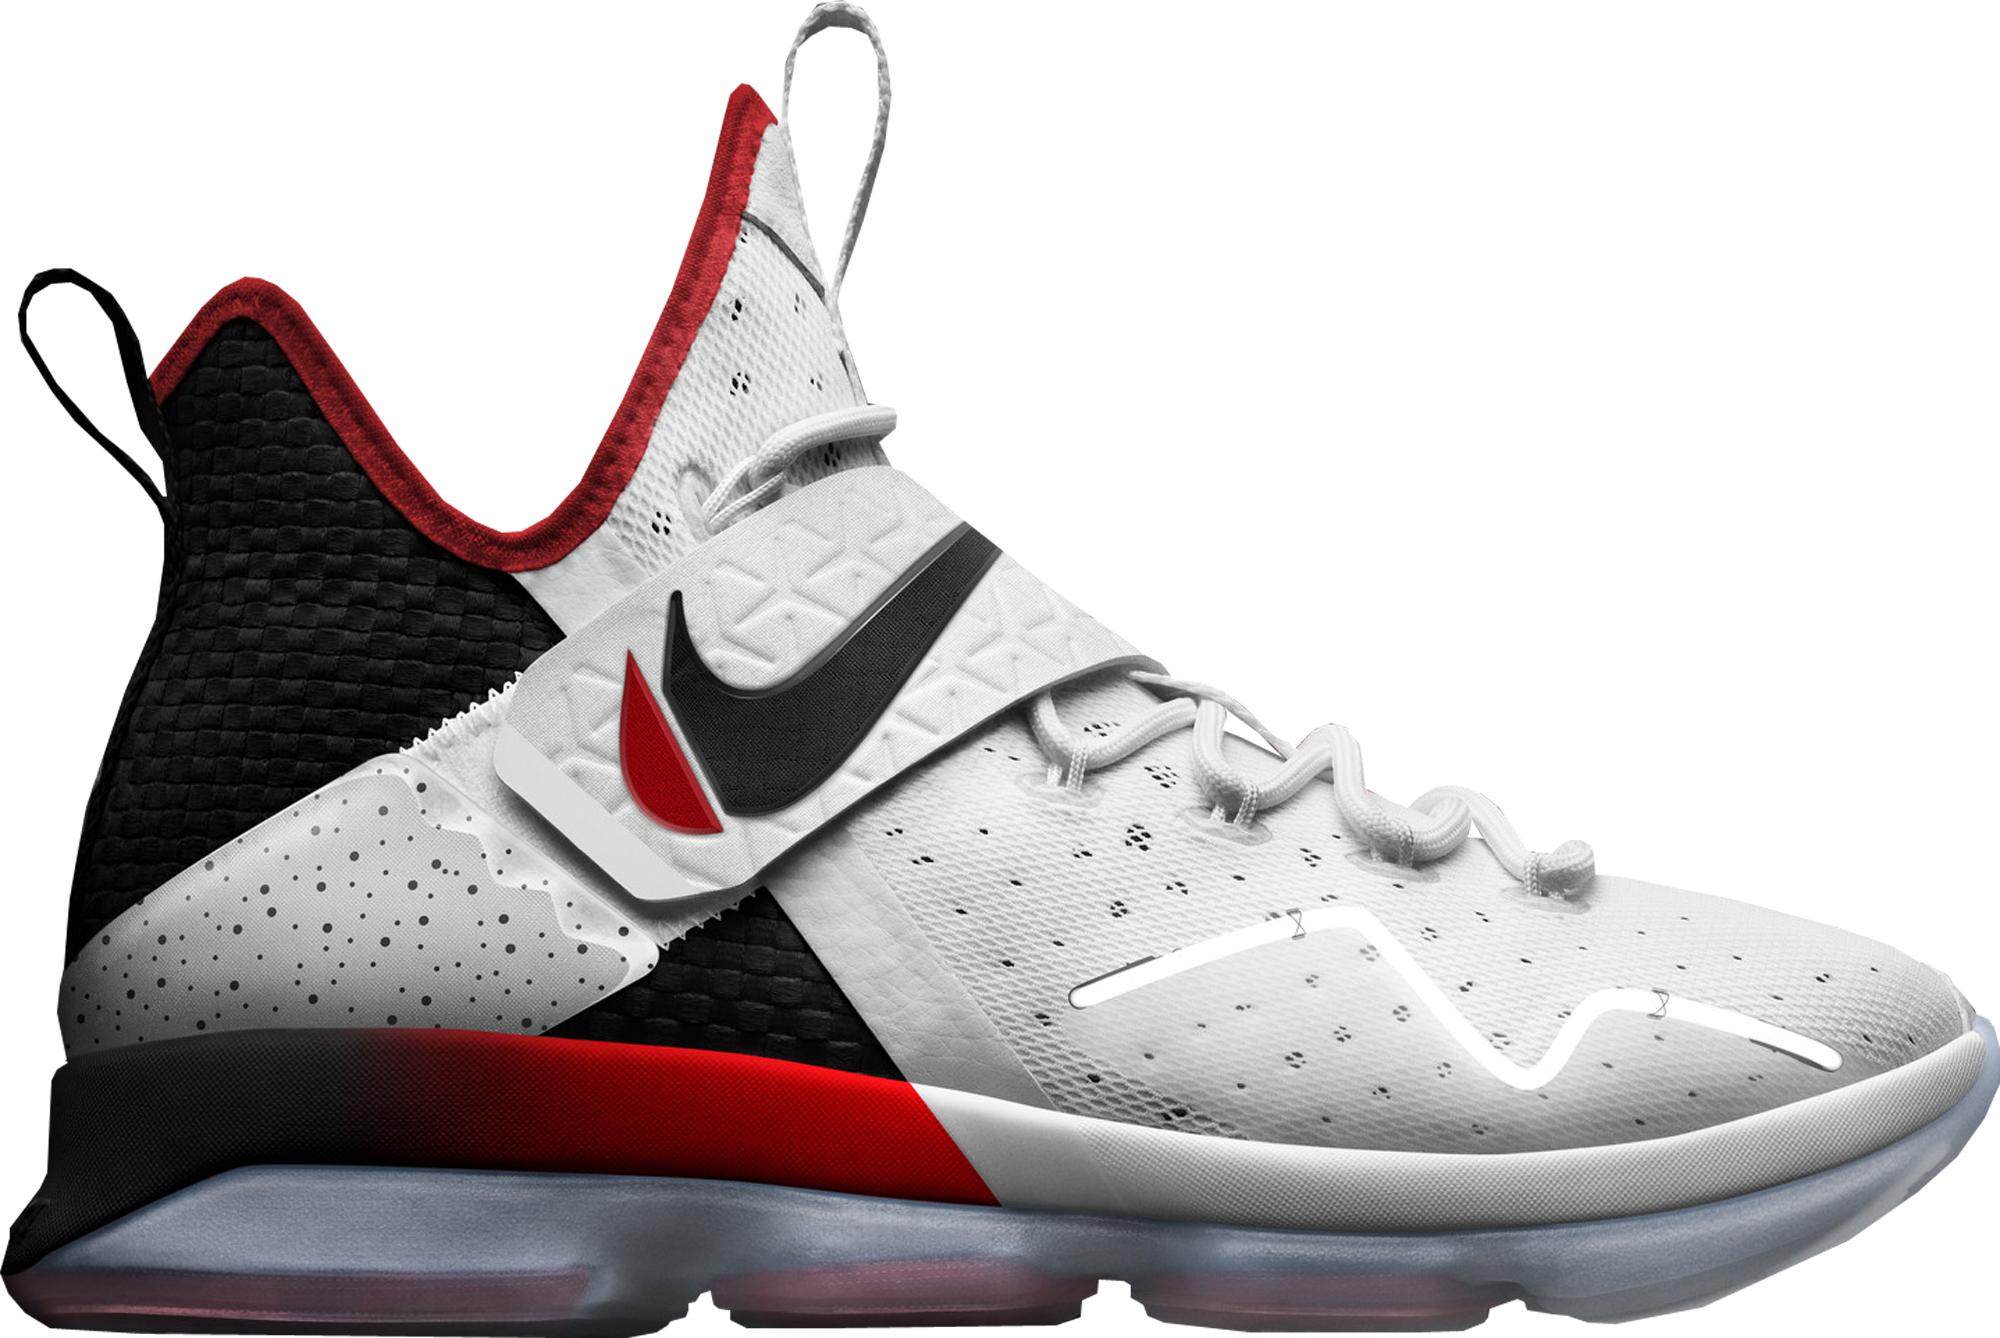 225f77a9a1f Nike LeBron 14 Flip The Switch - StockX News